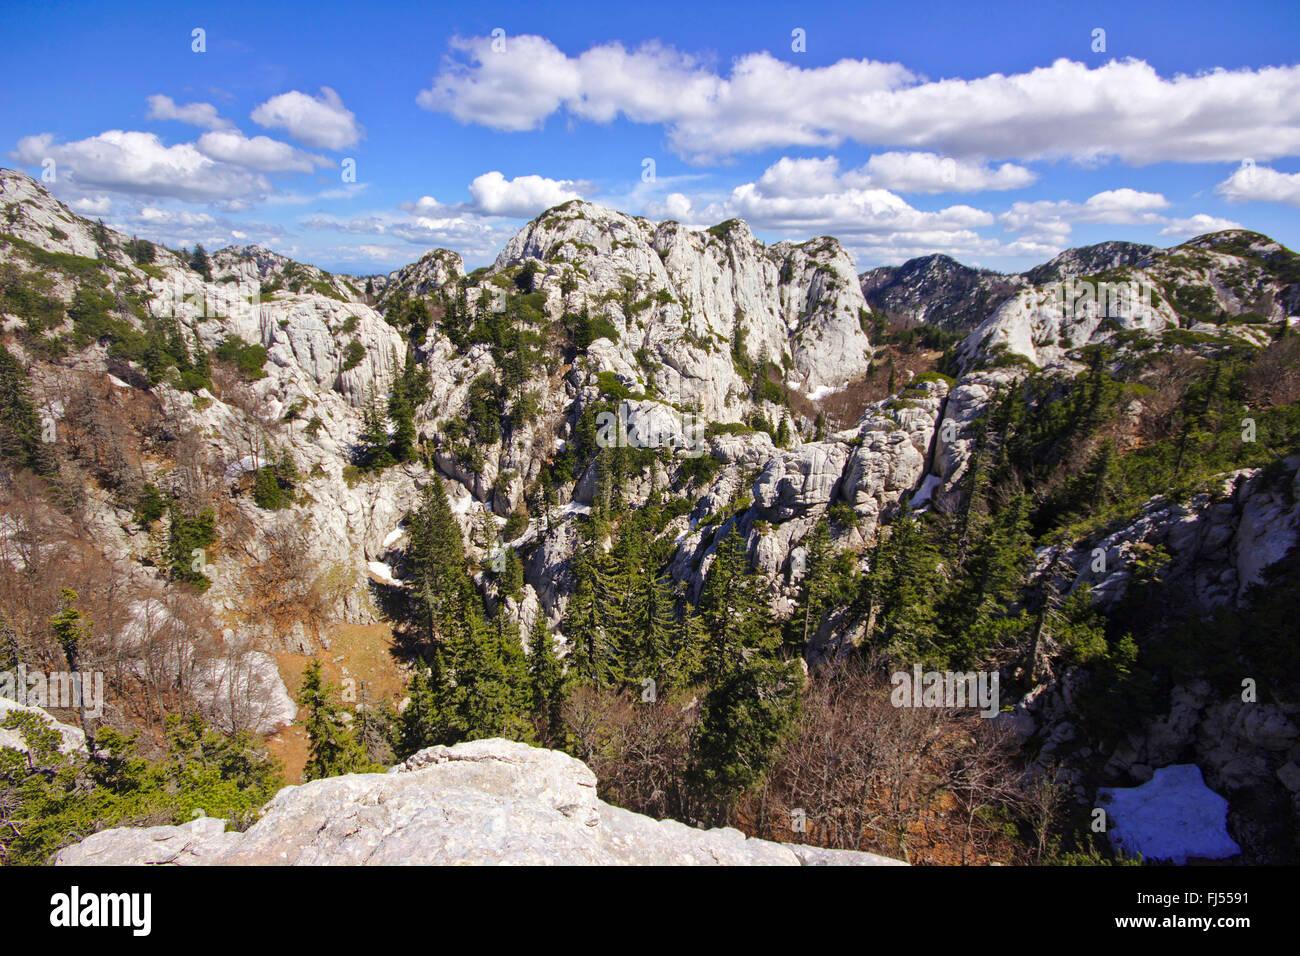 dolina in karst landscape, Croatia, Northern Velebit National Park Stock Photo